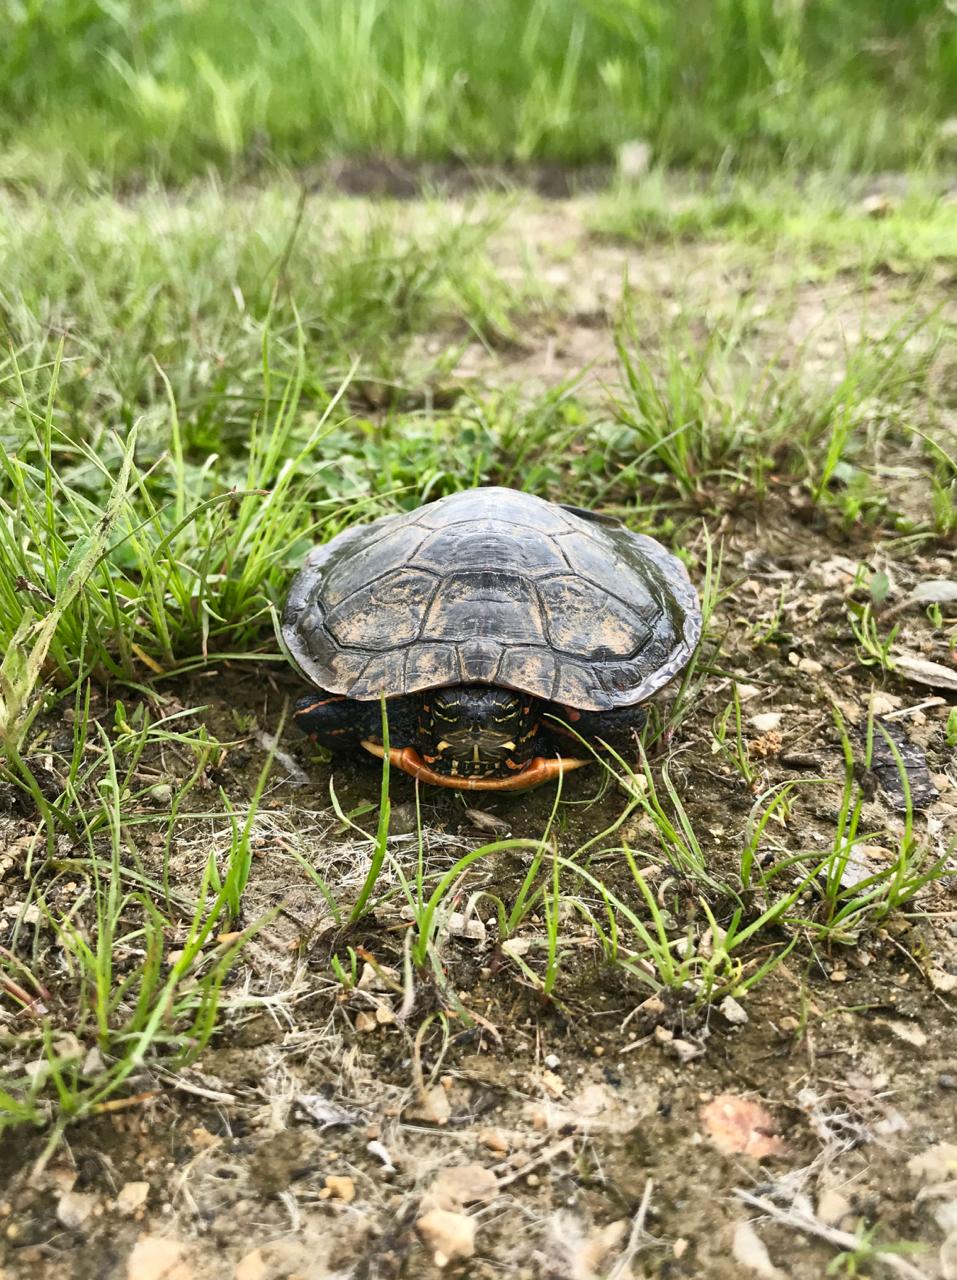 Shelled. UW Arboretum. Madison, Wisconsin. May 2018. © William D. Walker